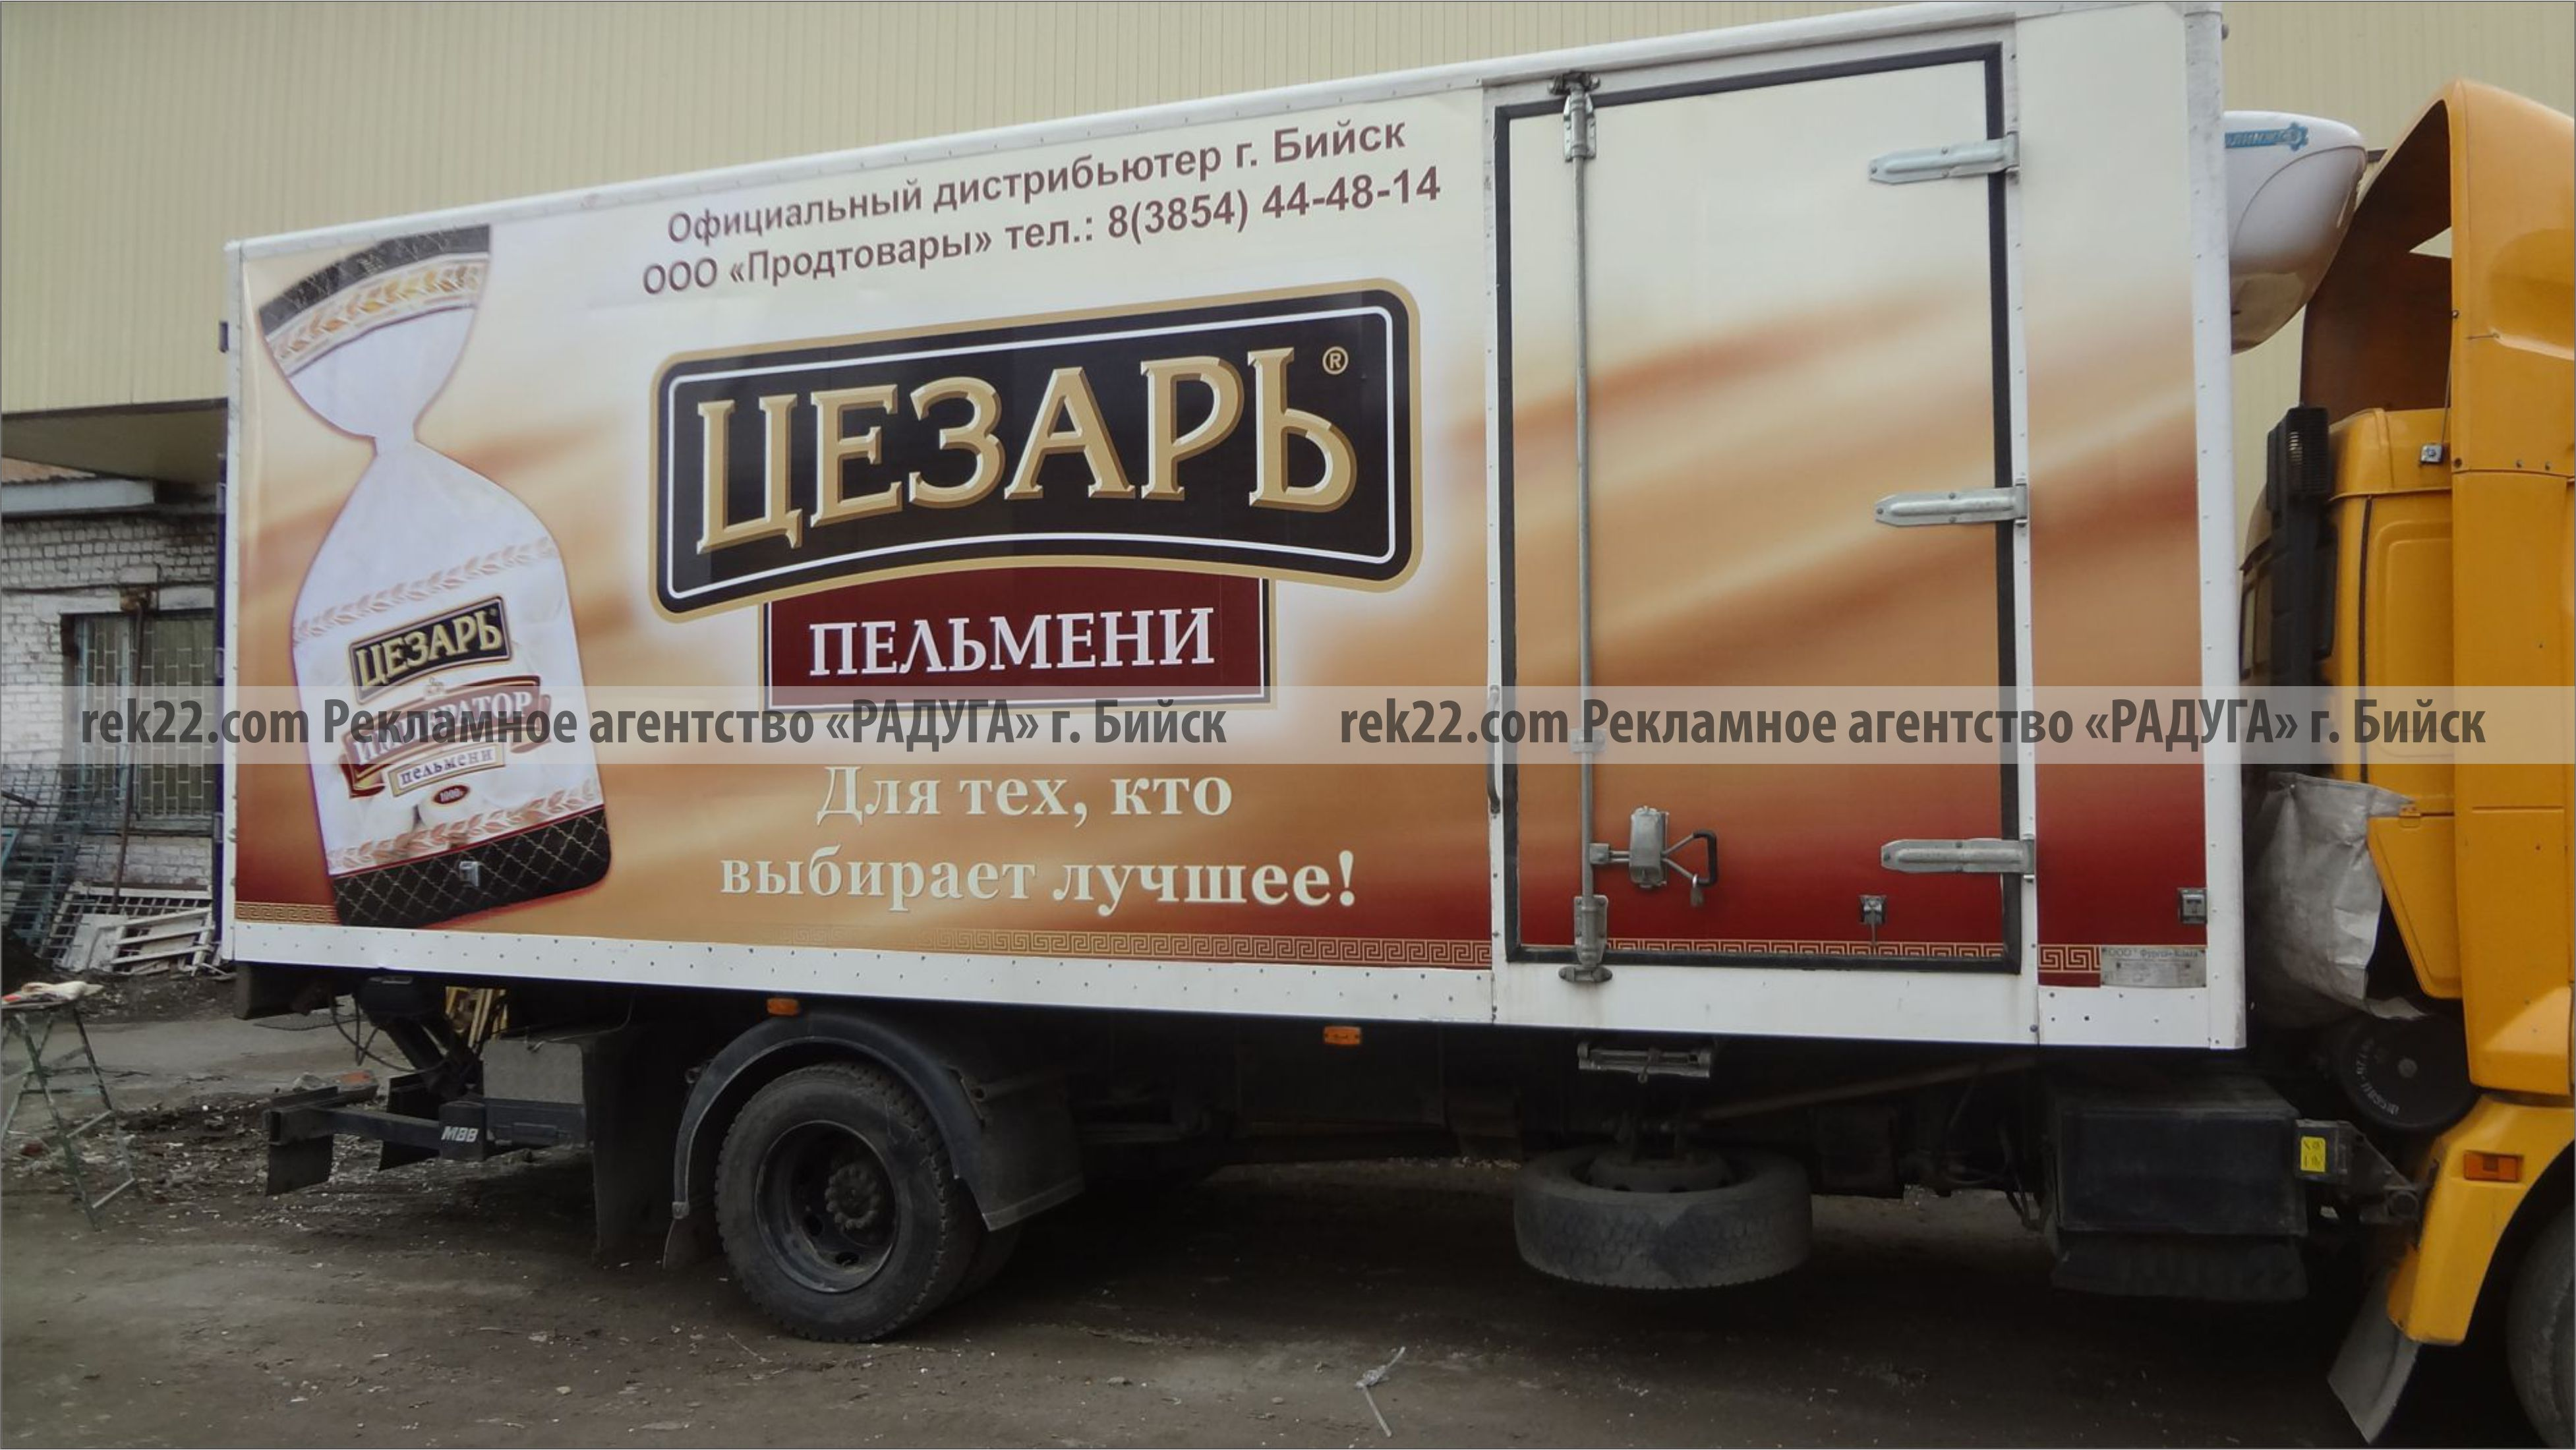 Реклама на транспорте Бийск - оклейка авто - 1